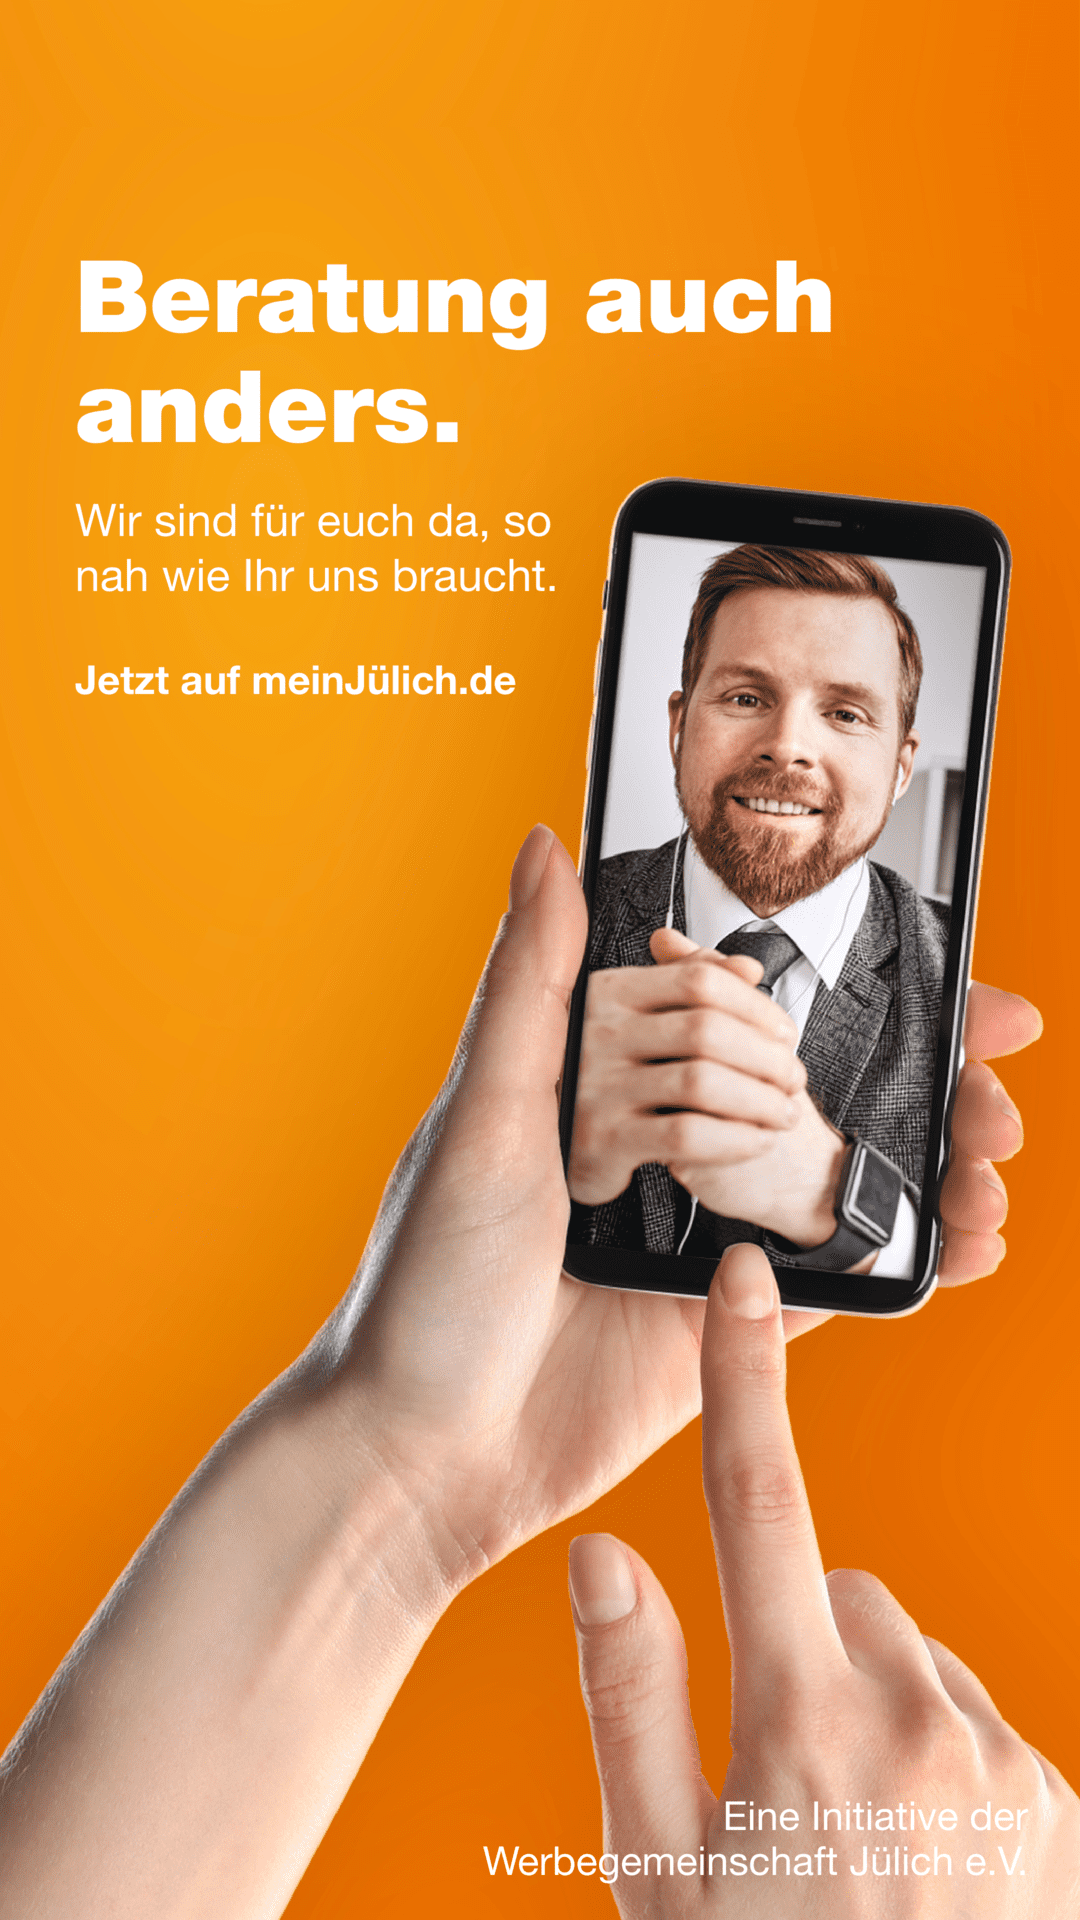 059.151-meinjuelichde_story_beratung-anders-2021